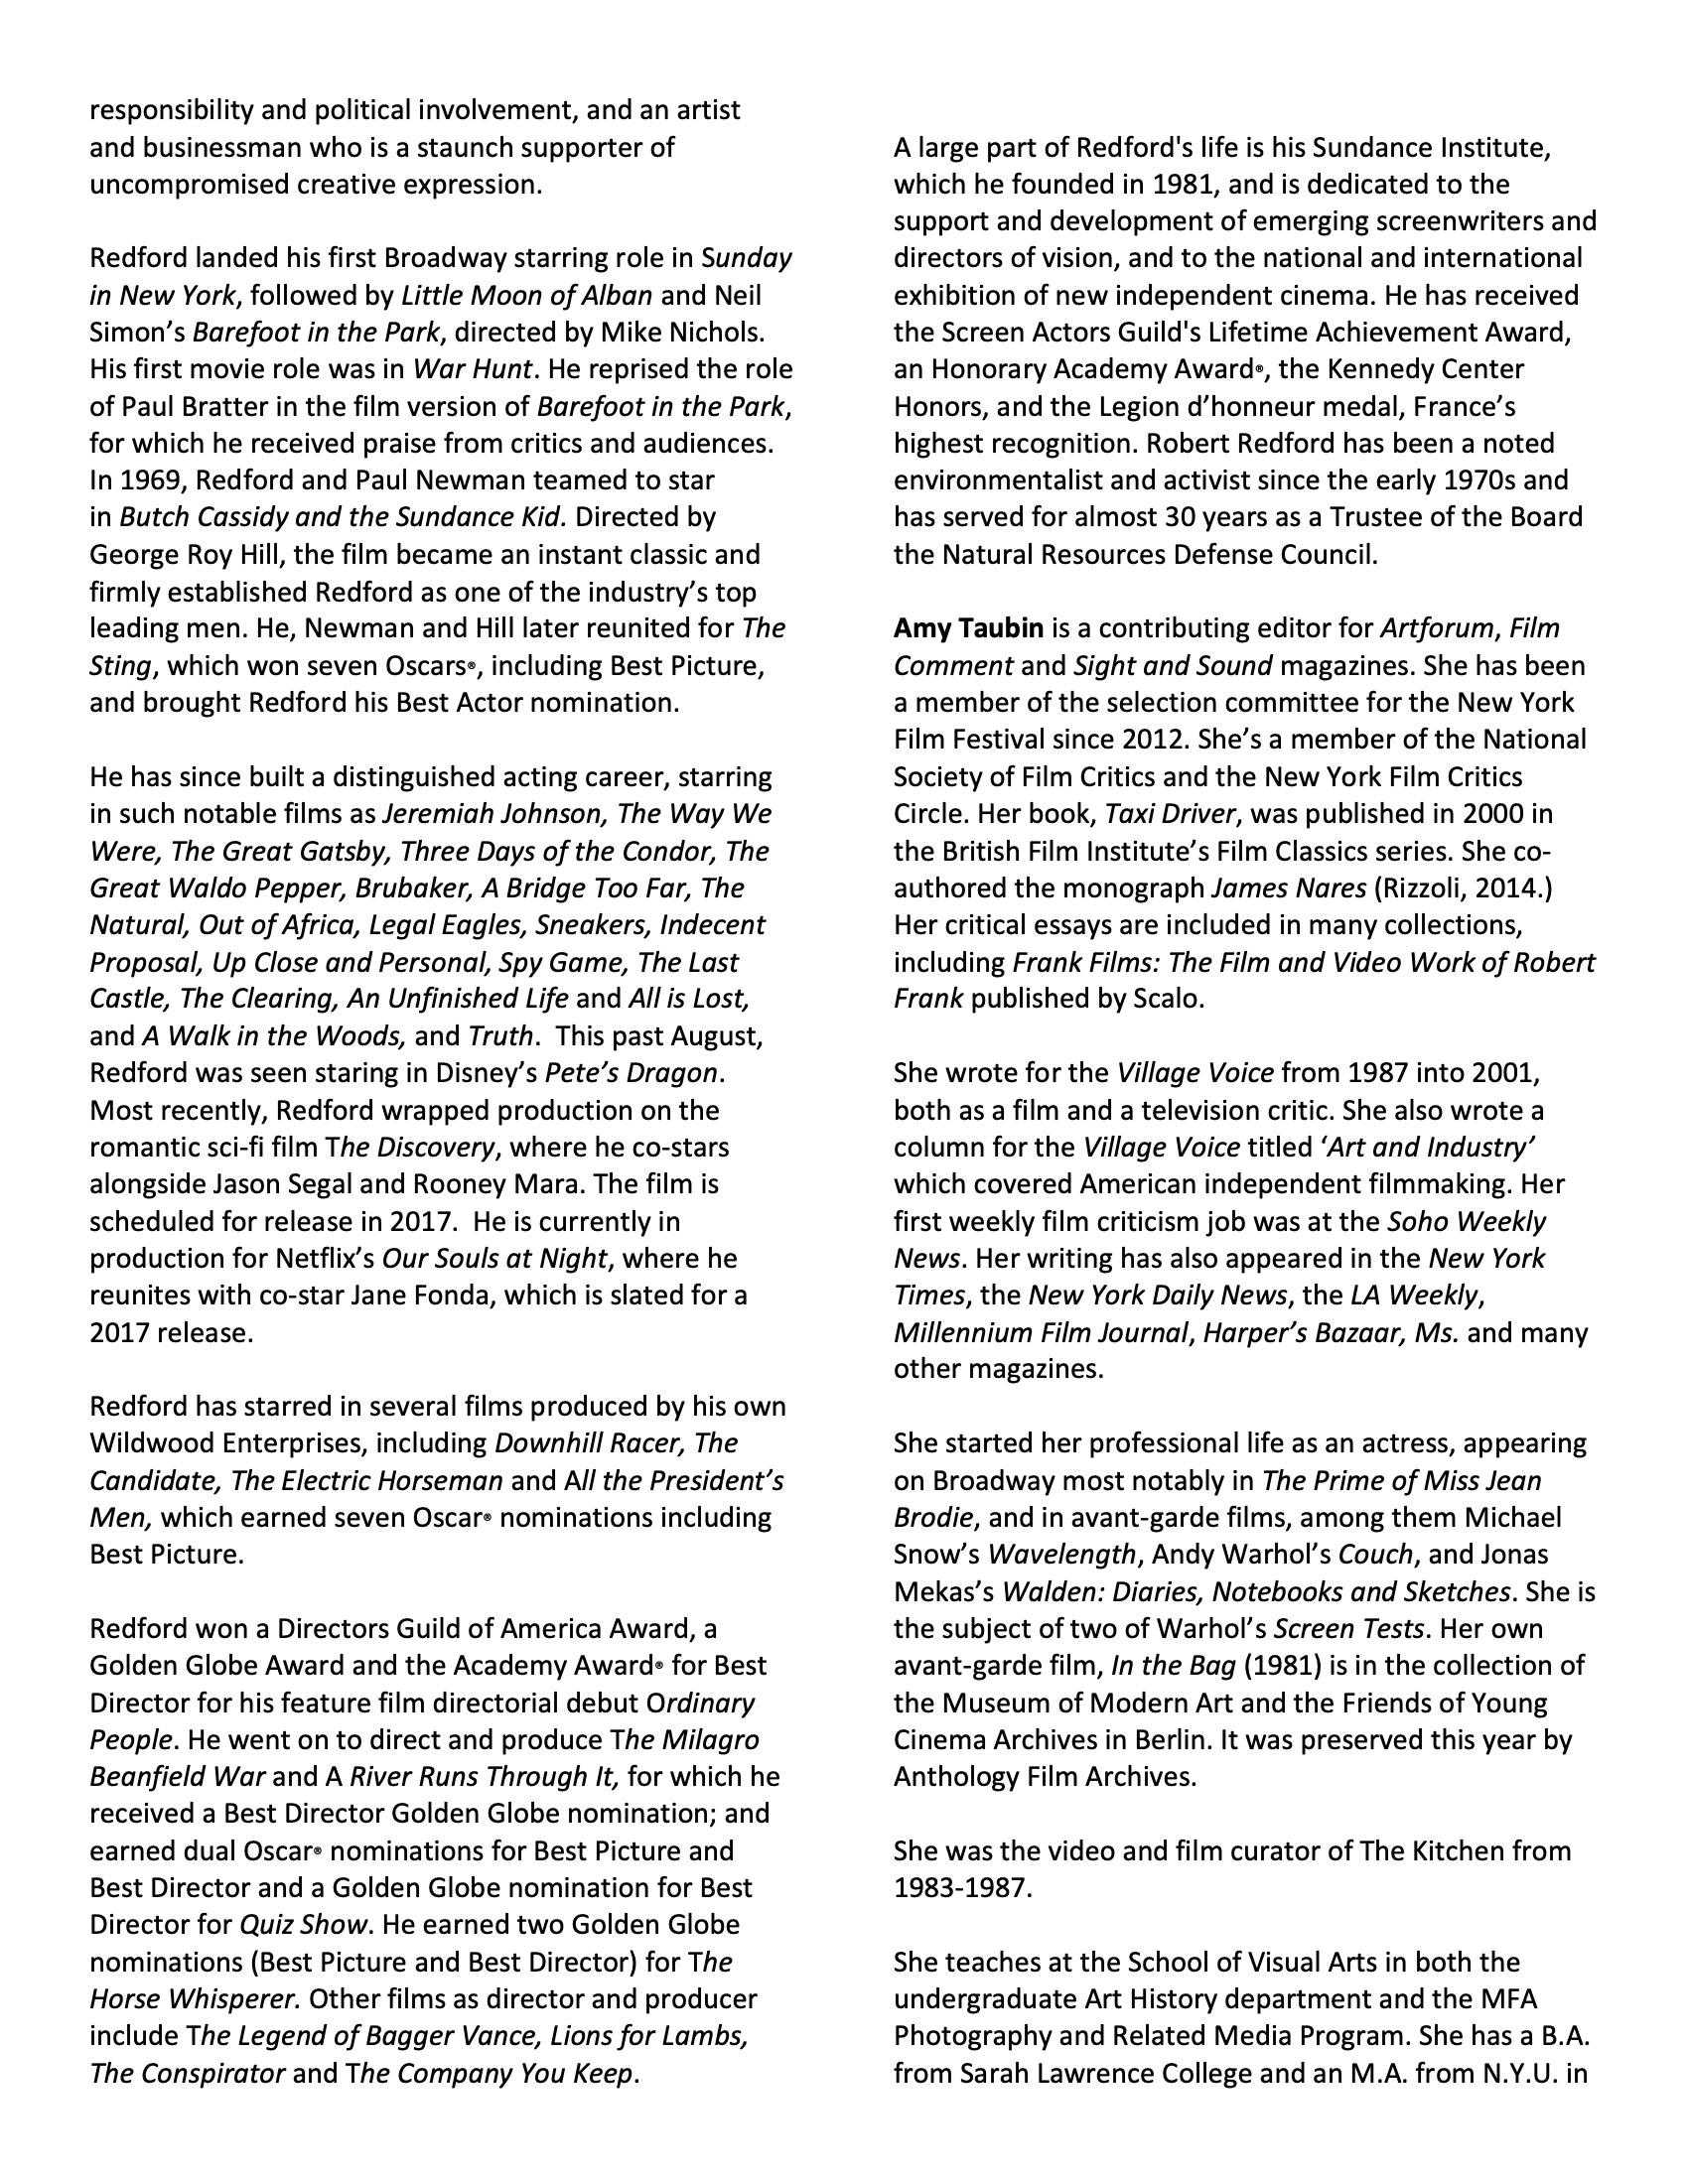 Robert Redford program notes pg 4